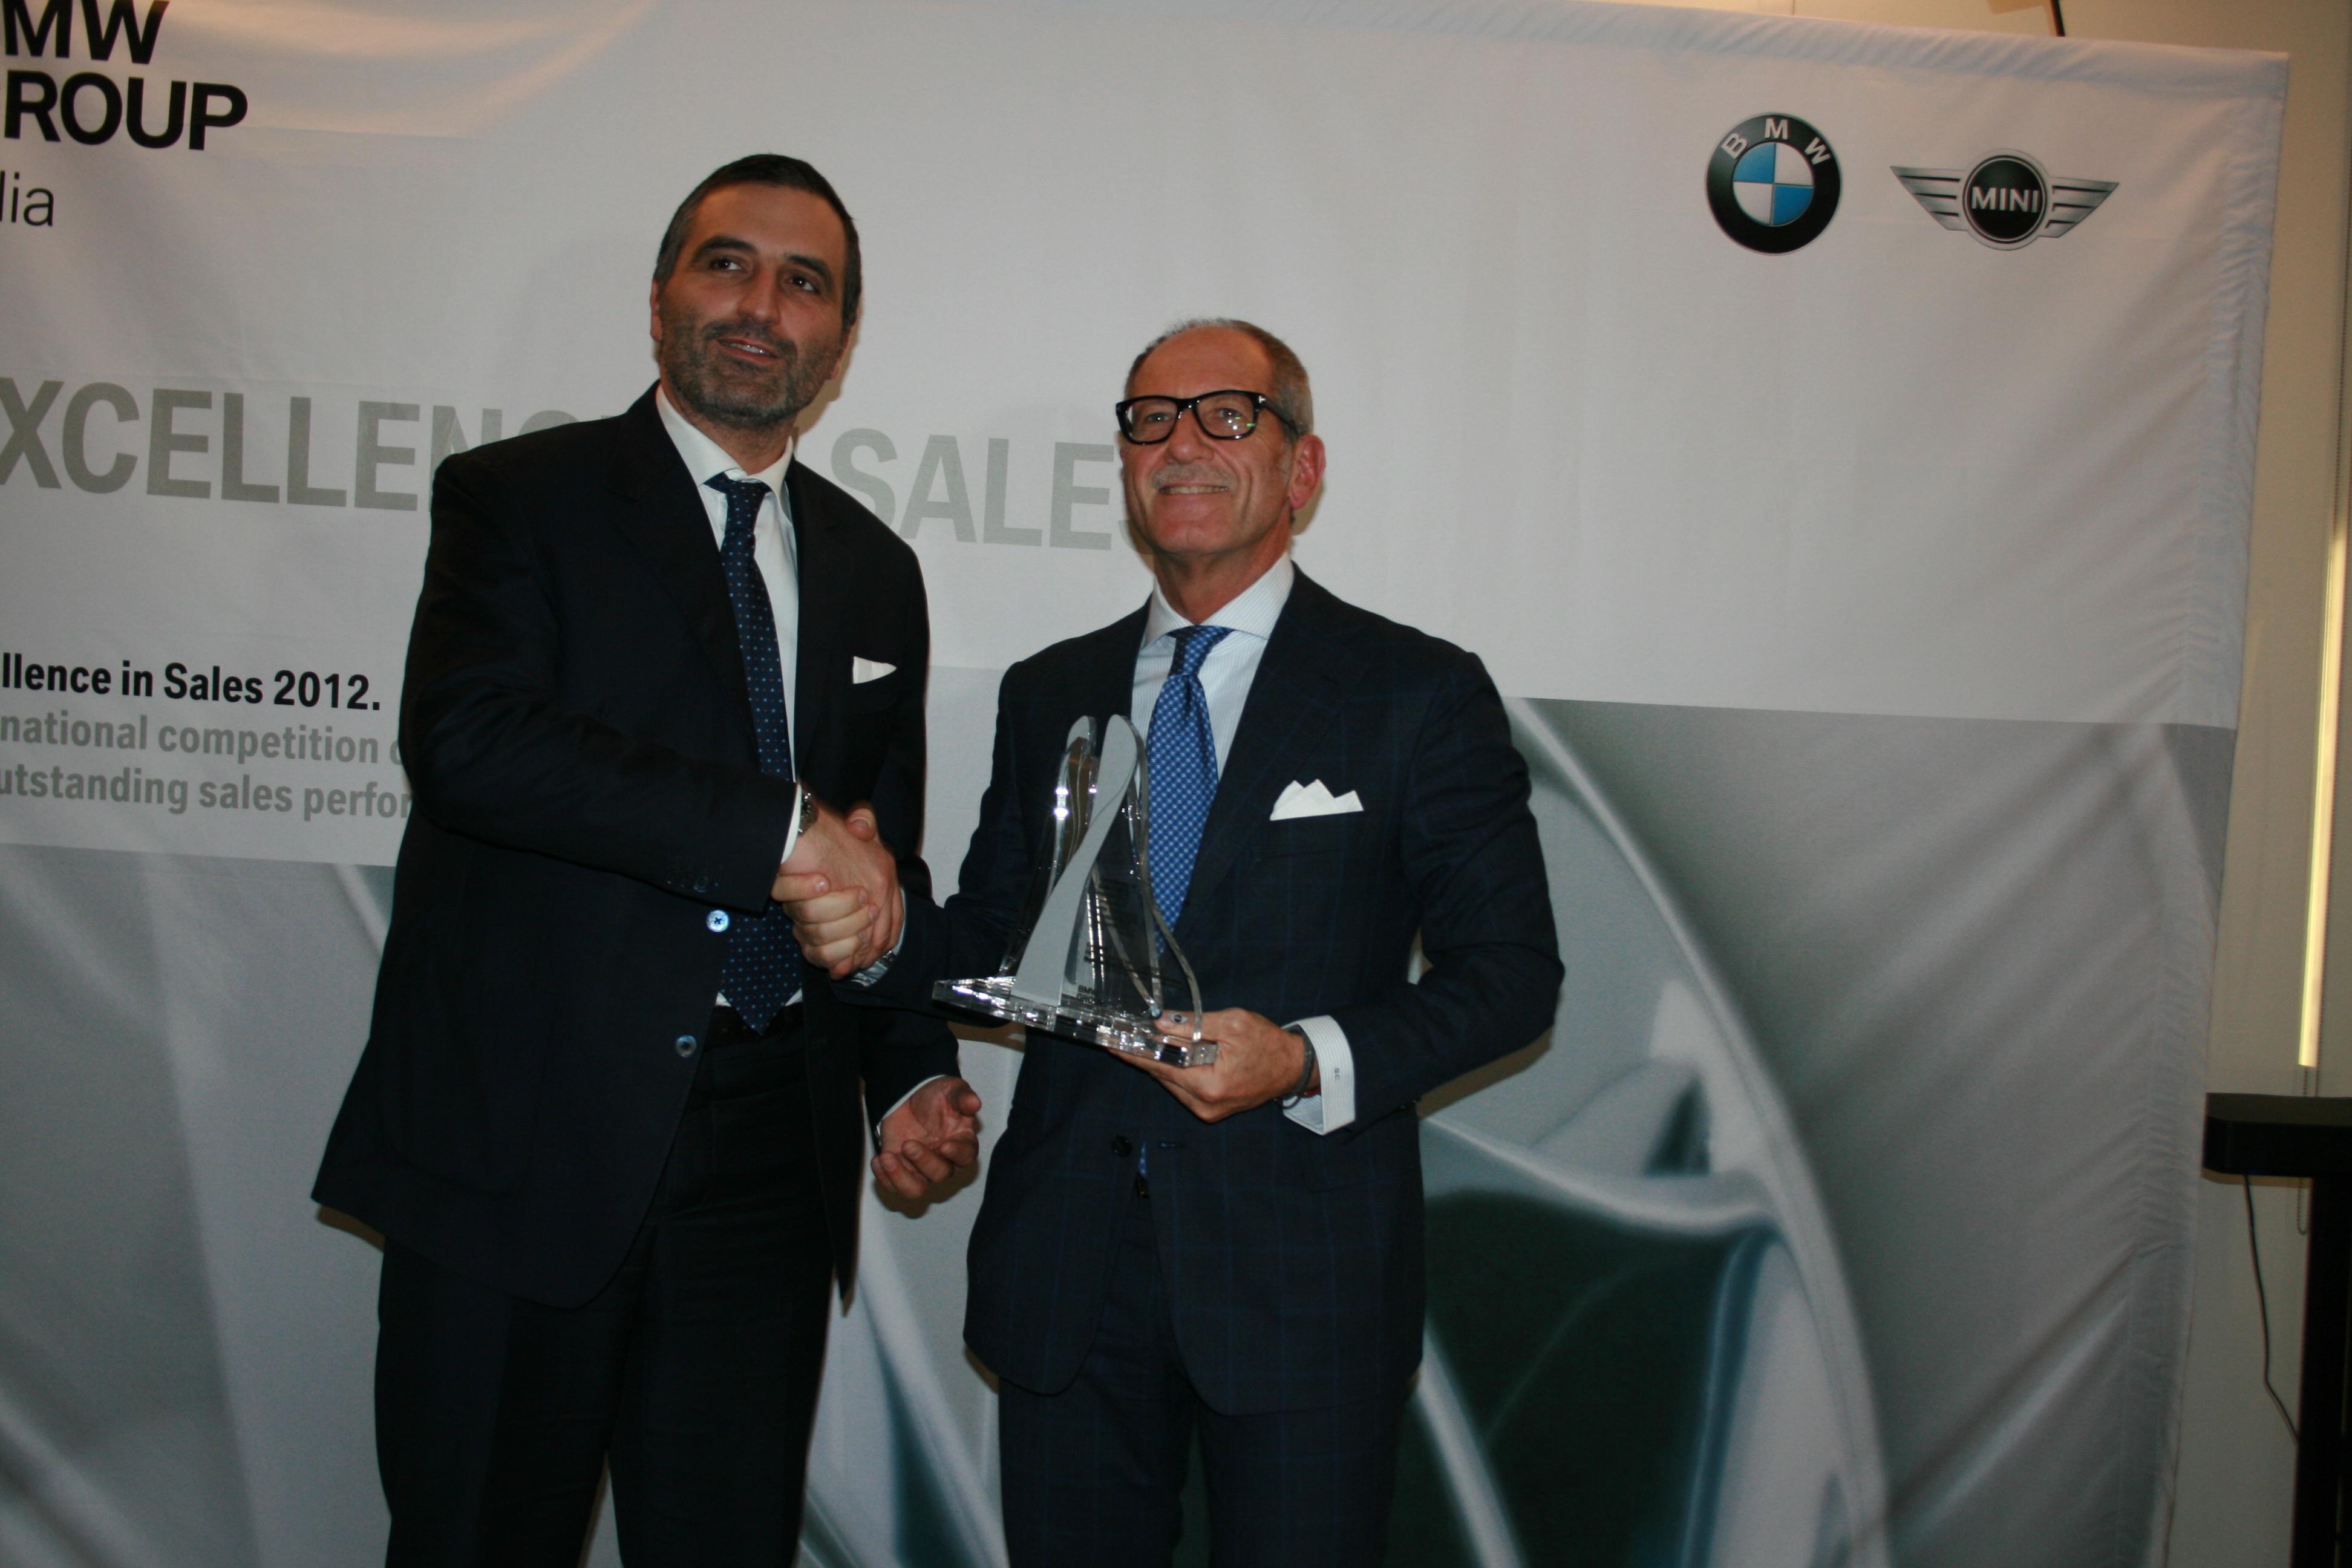 Cascioli Bmw, Excellence in Sales 2